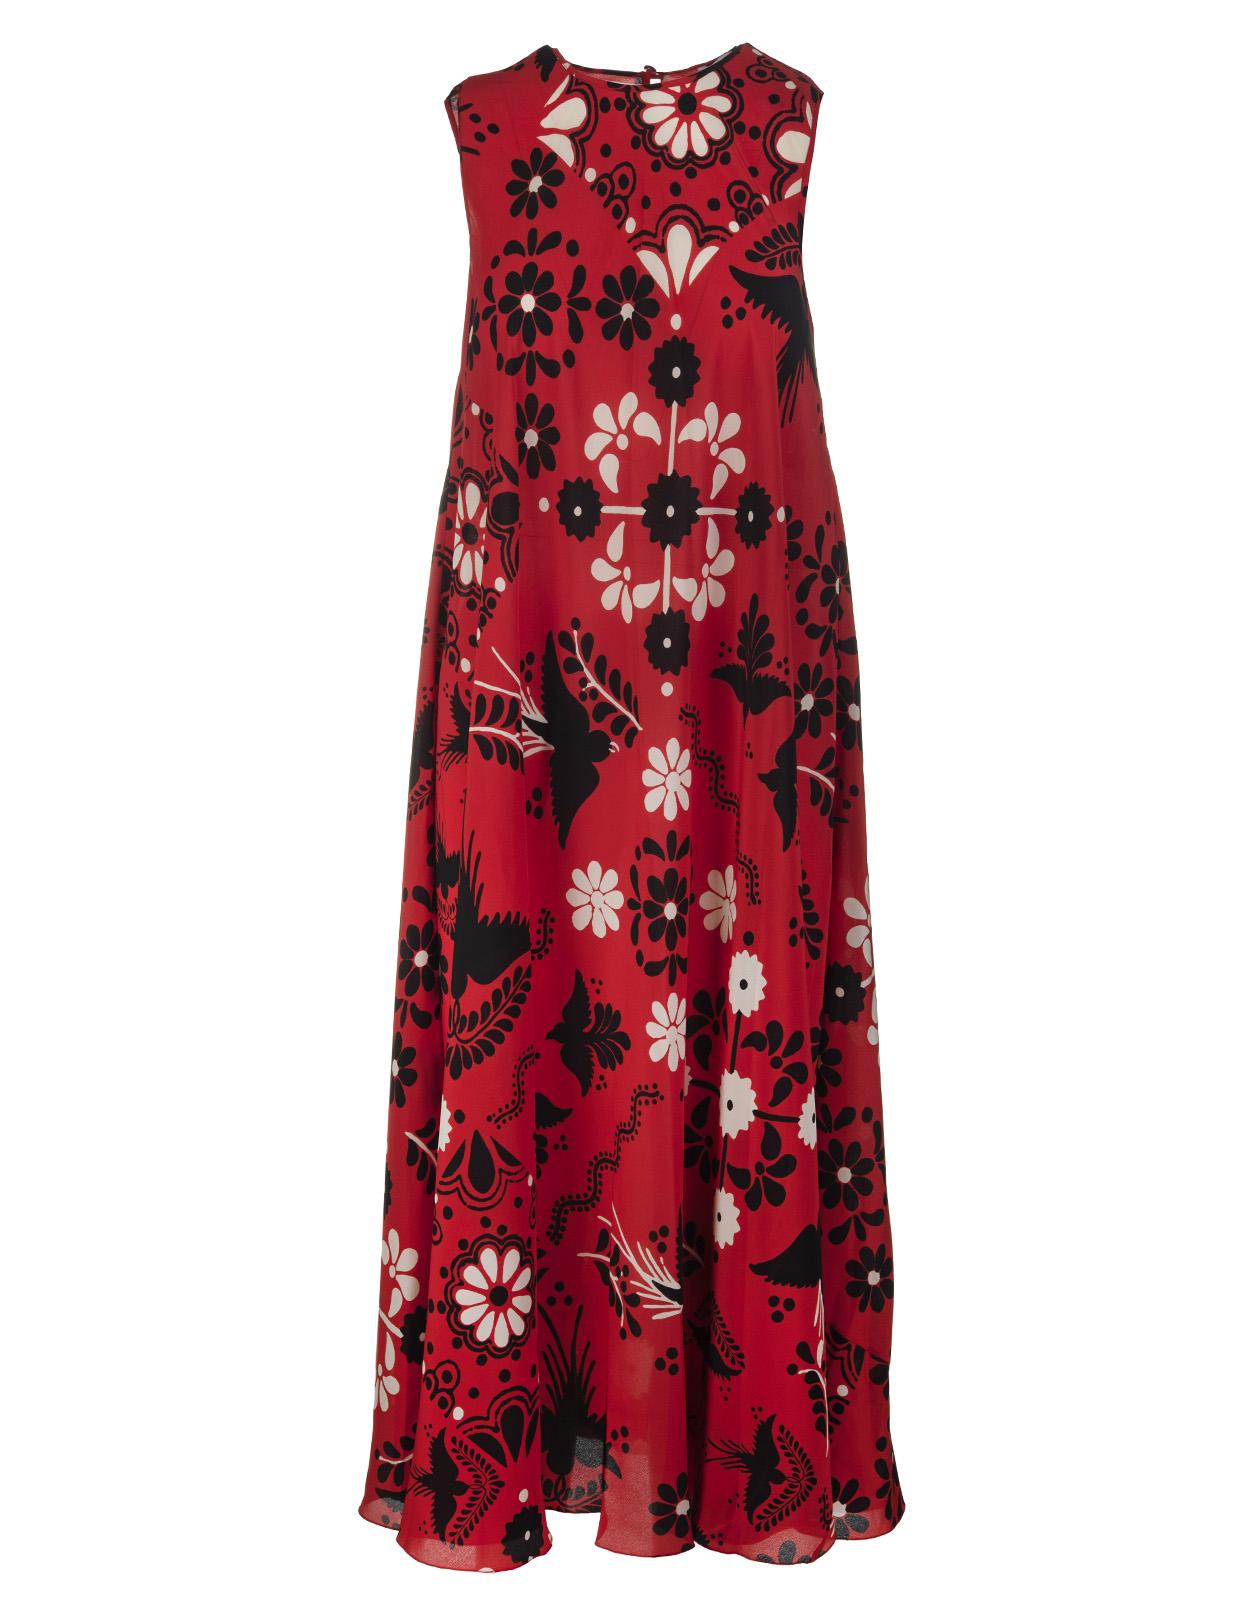 cecc34377b4 Floreal Dress - RED VALENTINO - Russocapri